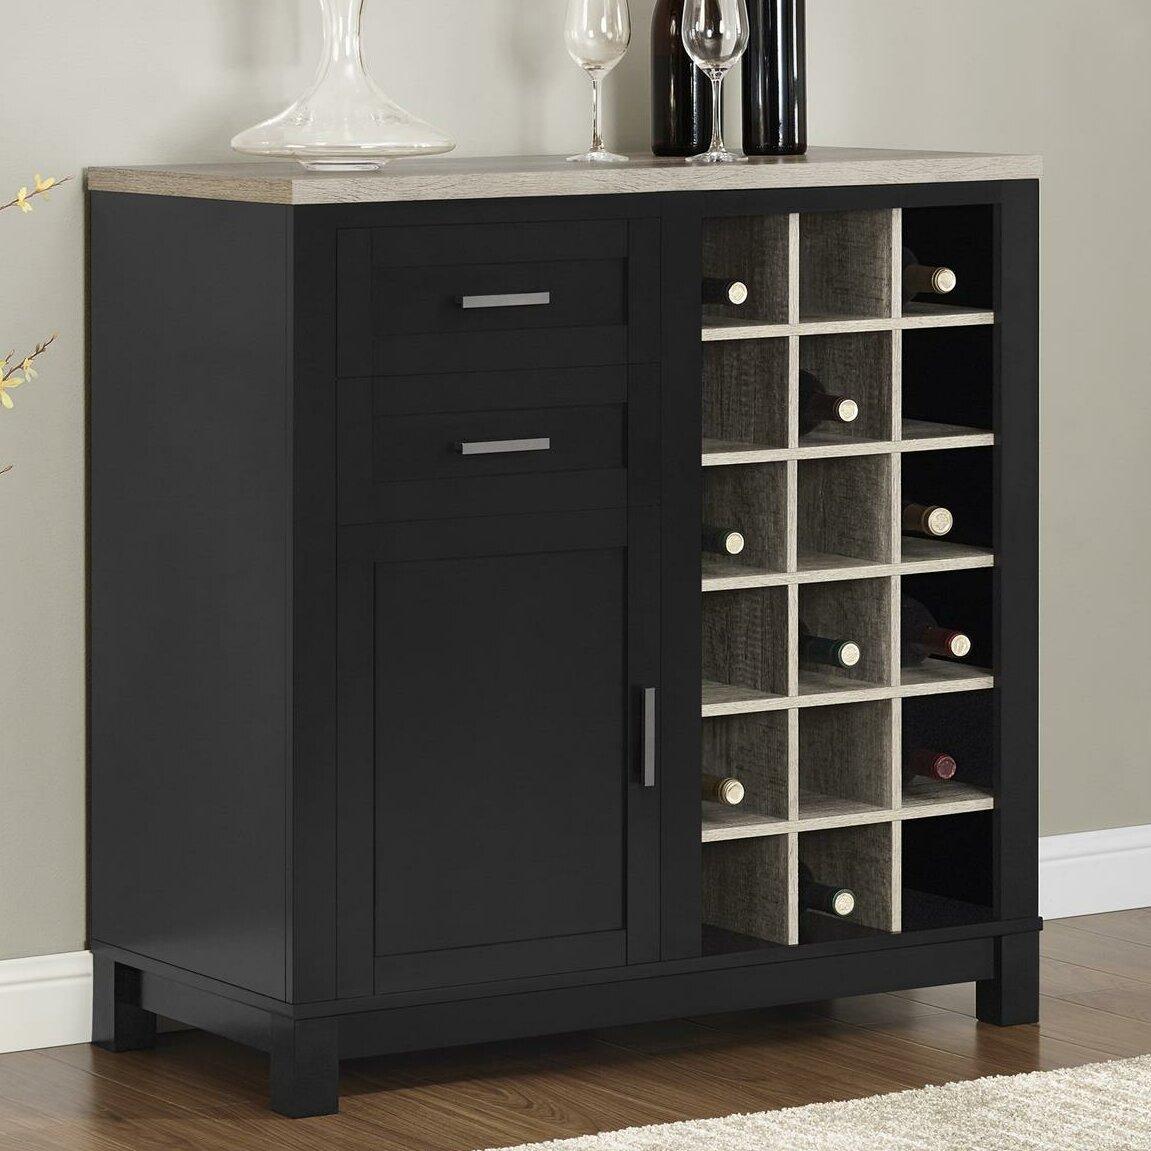 Home Liquor Cabinet: Mercury Row Callowhill Bar Cabinet With Wine Storage